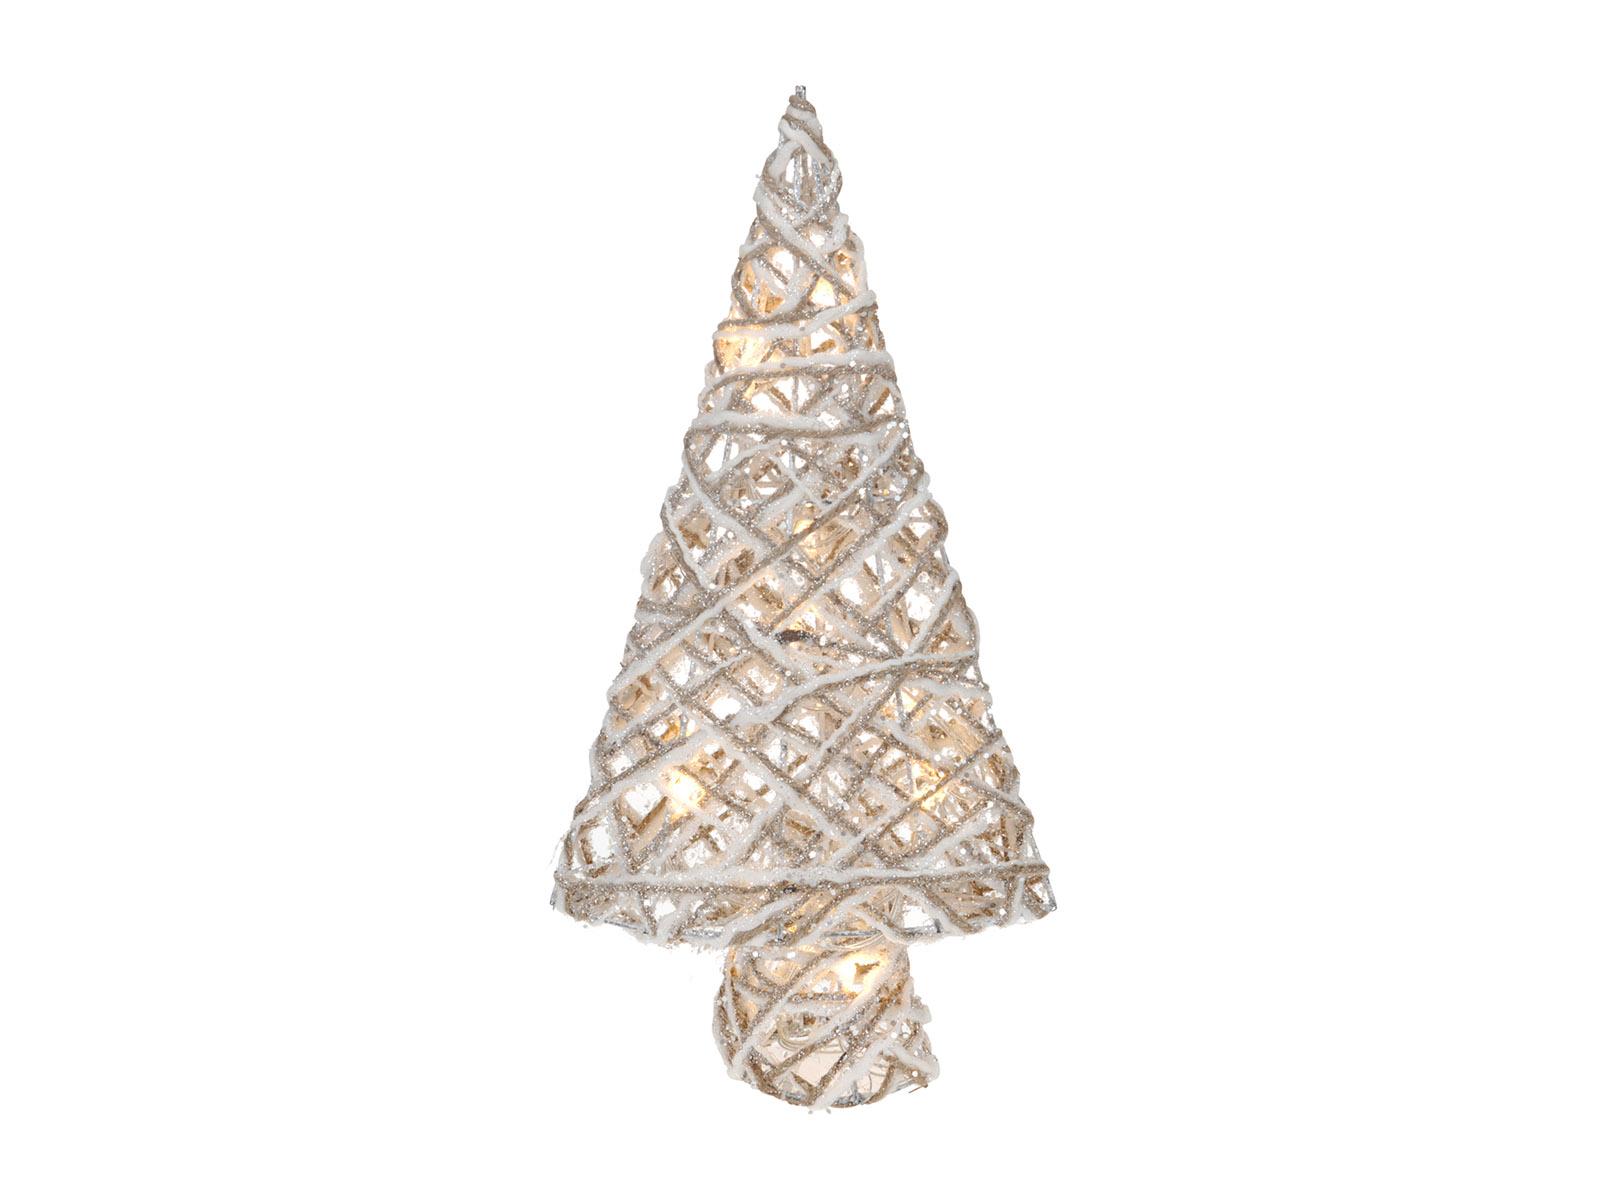 Светильник Christmas TreeНовогодний декор<br>Светильник декоративный, работающий от батареек<br>